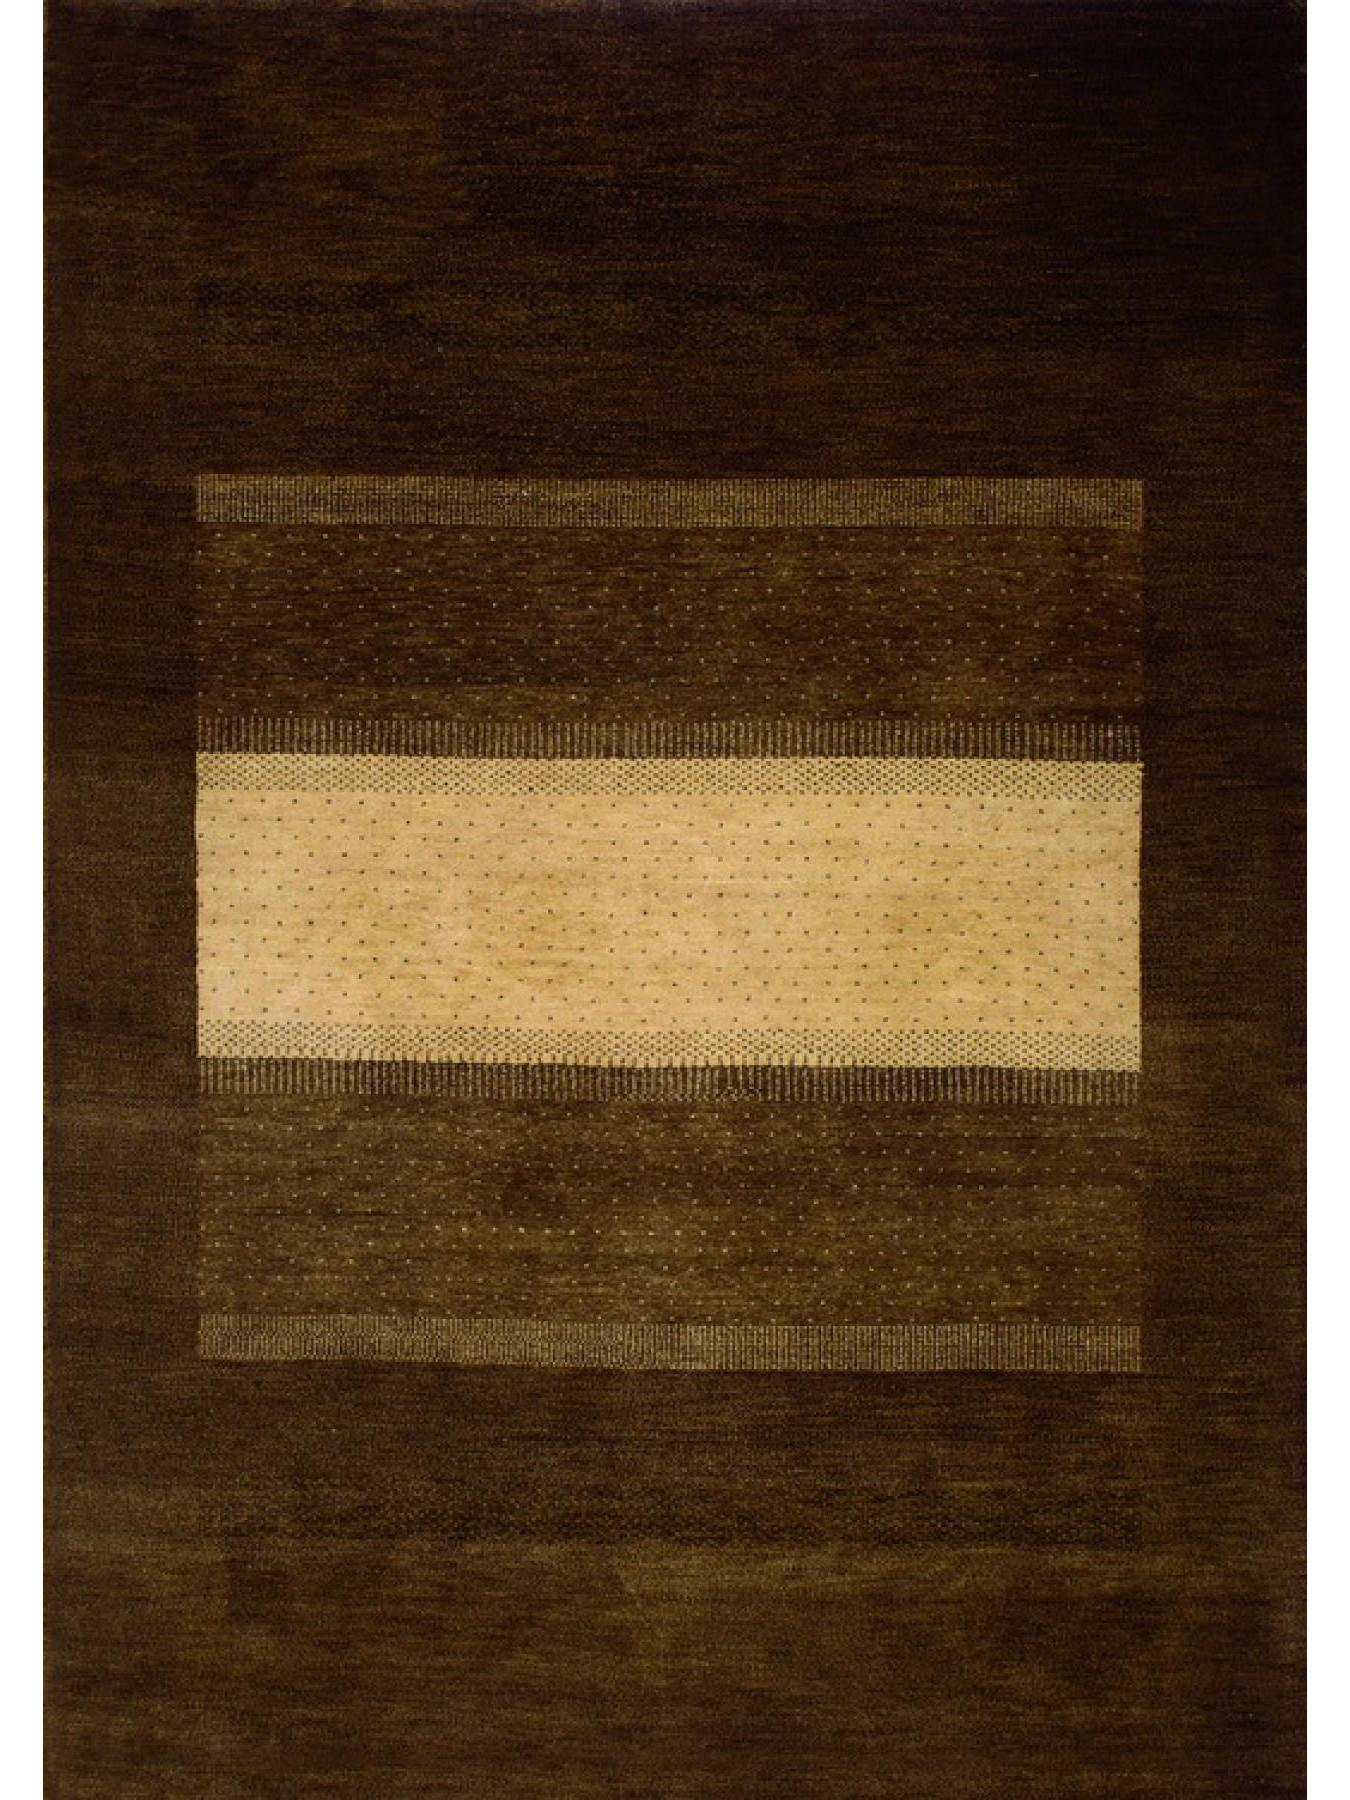 Ethnic carpets - FOLKLIFE 2 - 6600